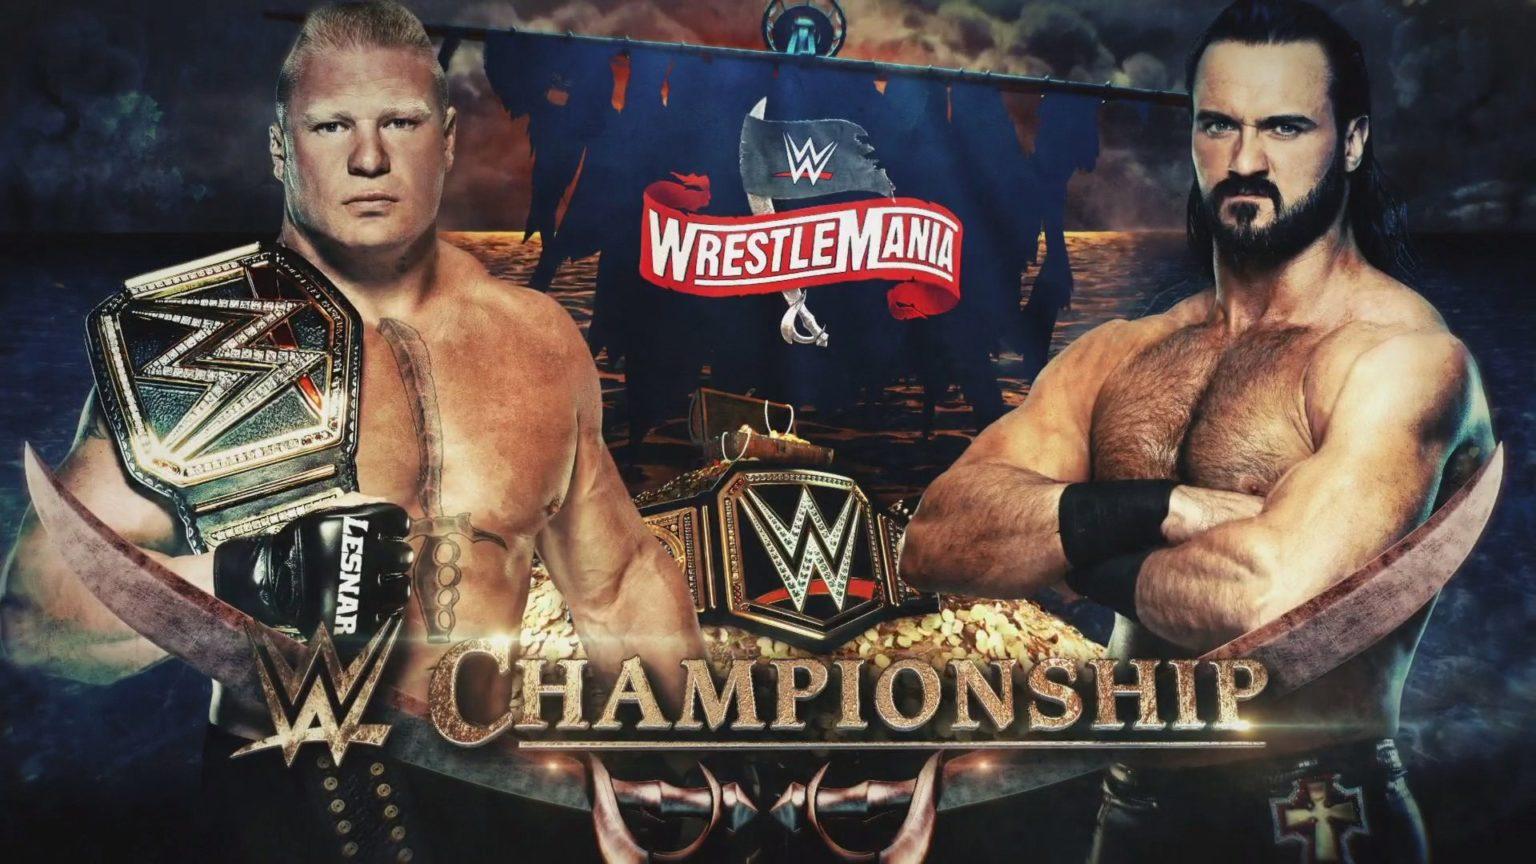 Drew McIntyre and Brock Lesnar